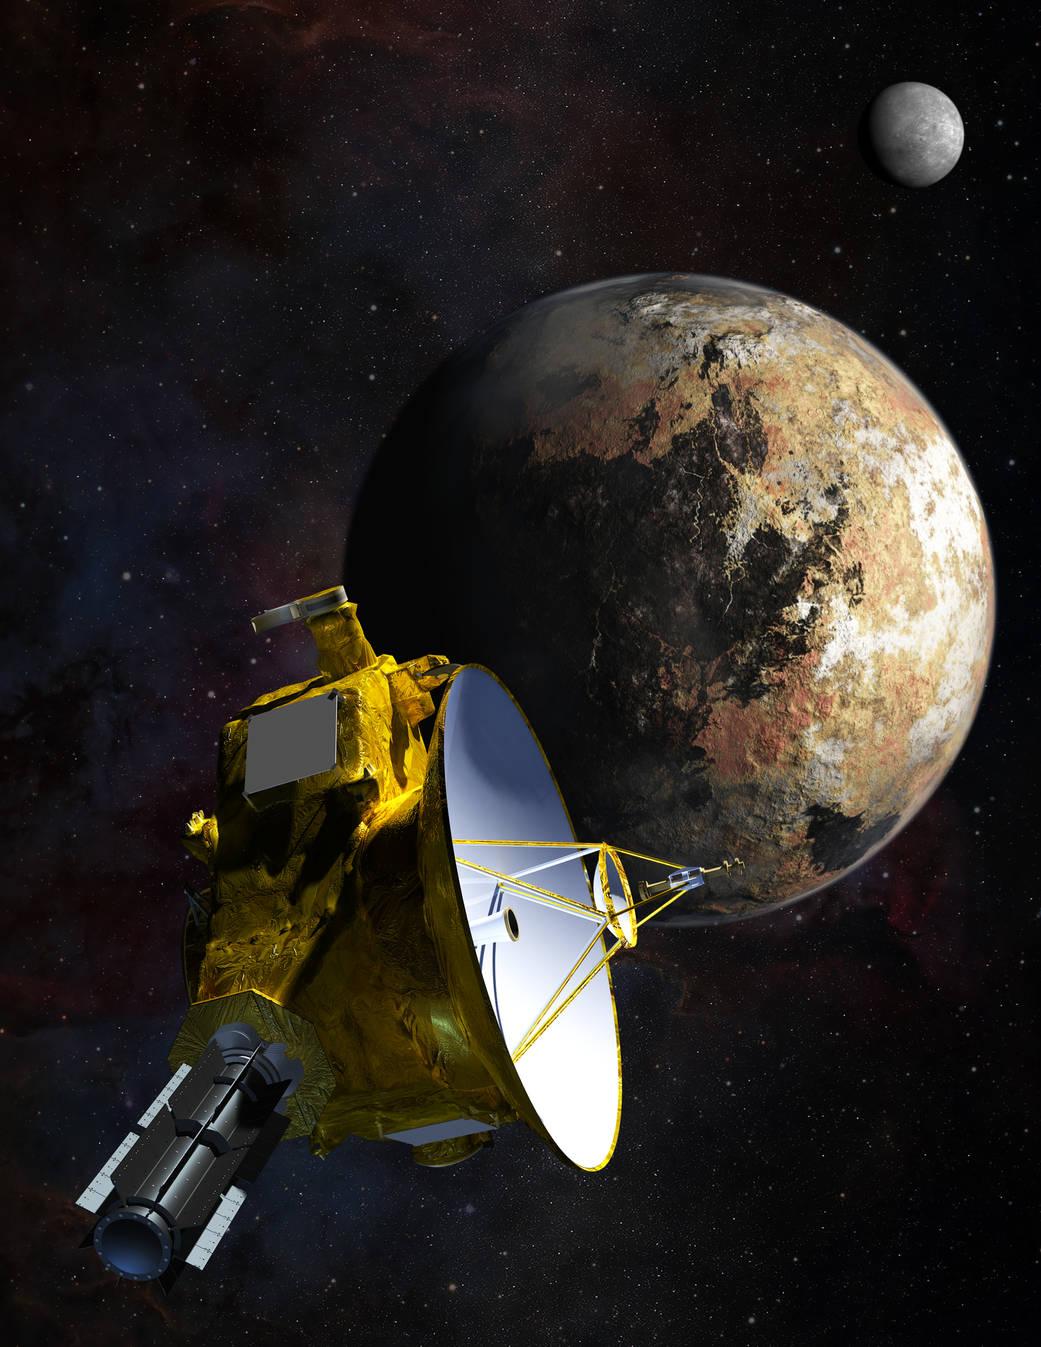 Representacíón artística de la aproximación de New Horizons a Plutón